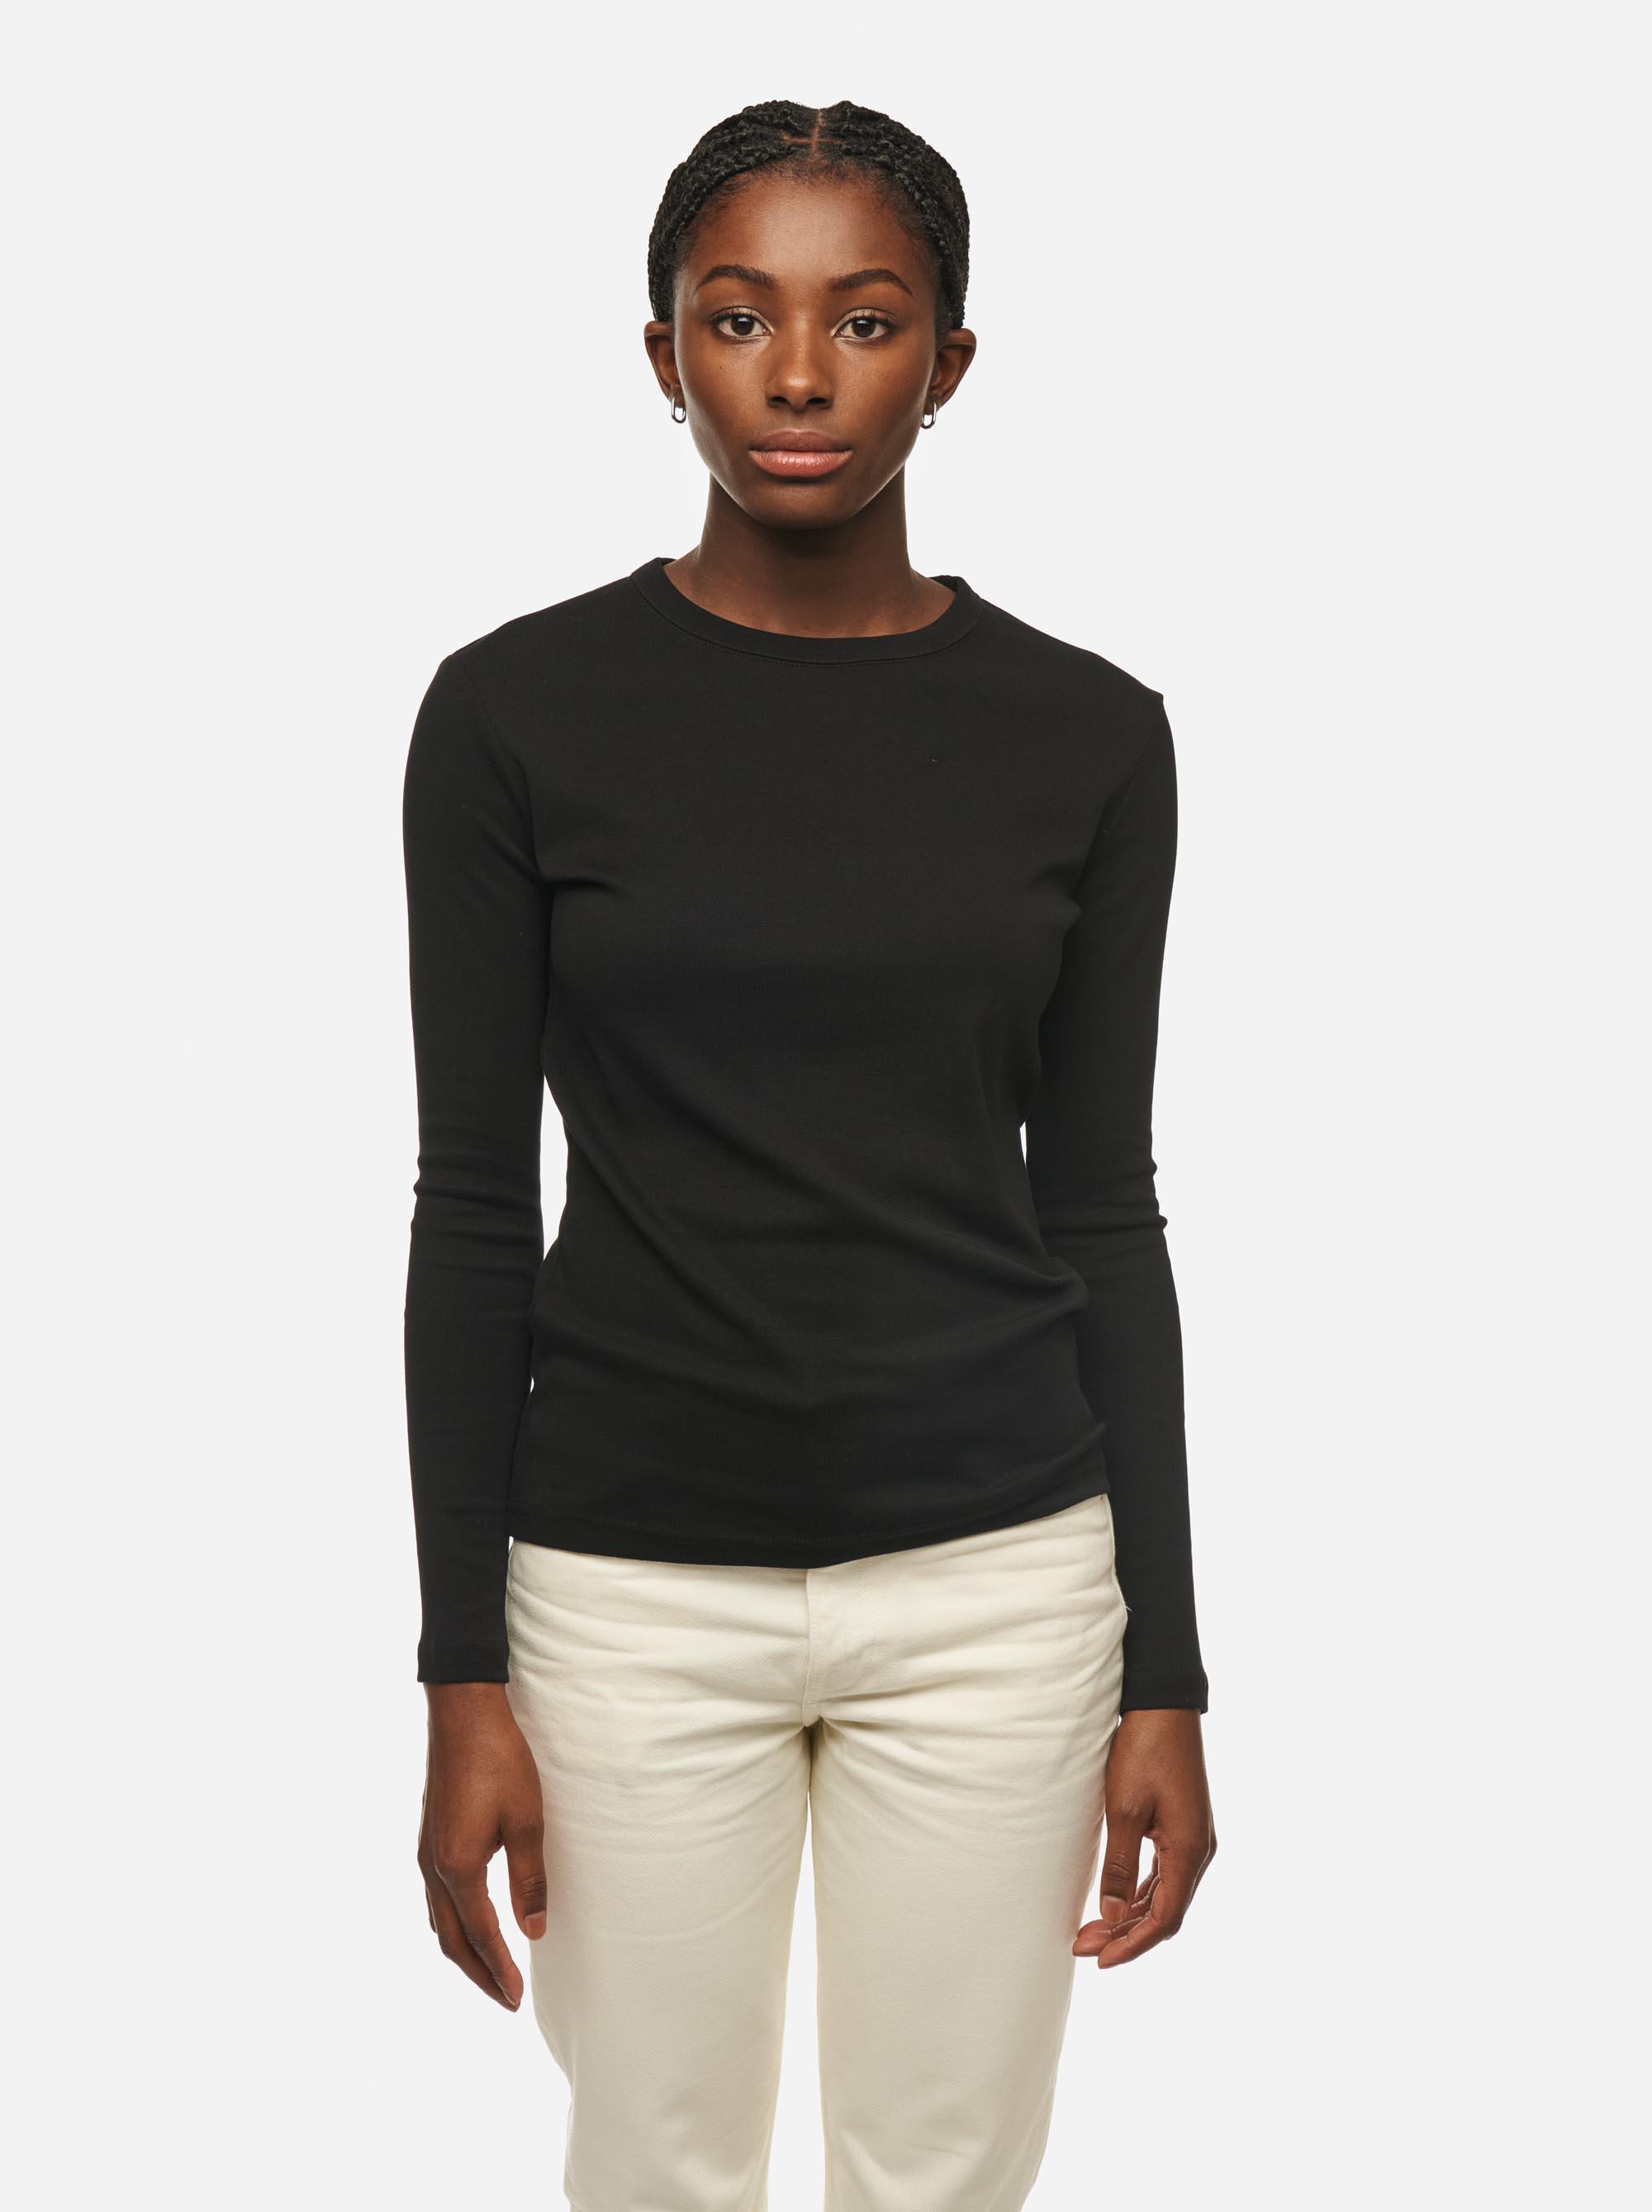 Teym - The-T-Shirt - Longsleeve - Women - Black - 3